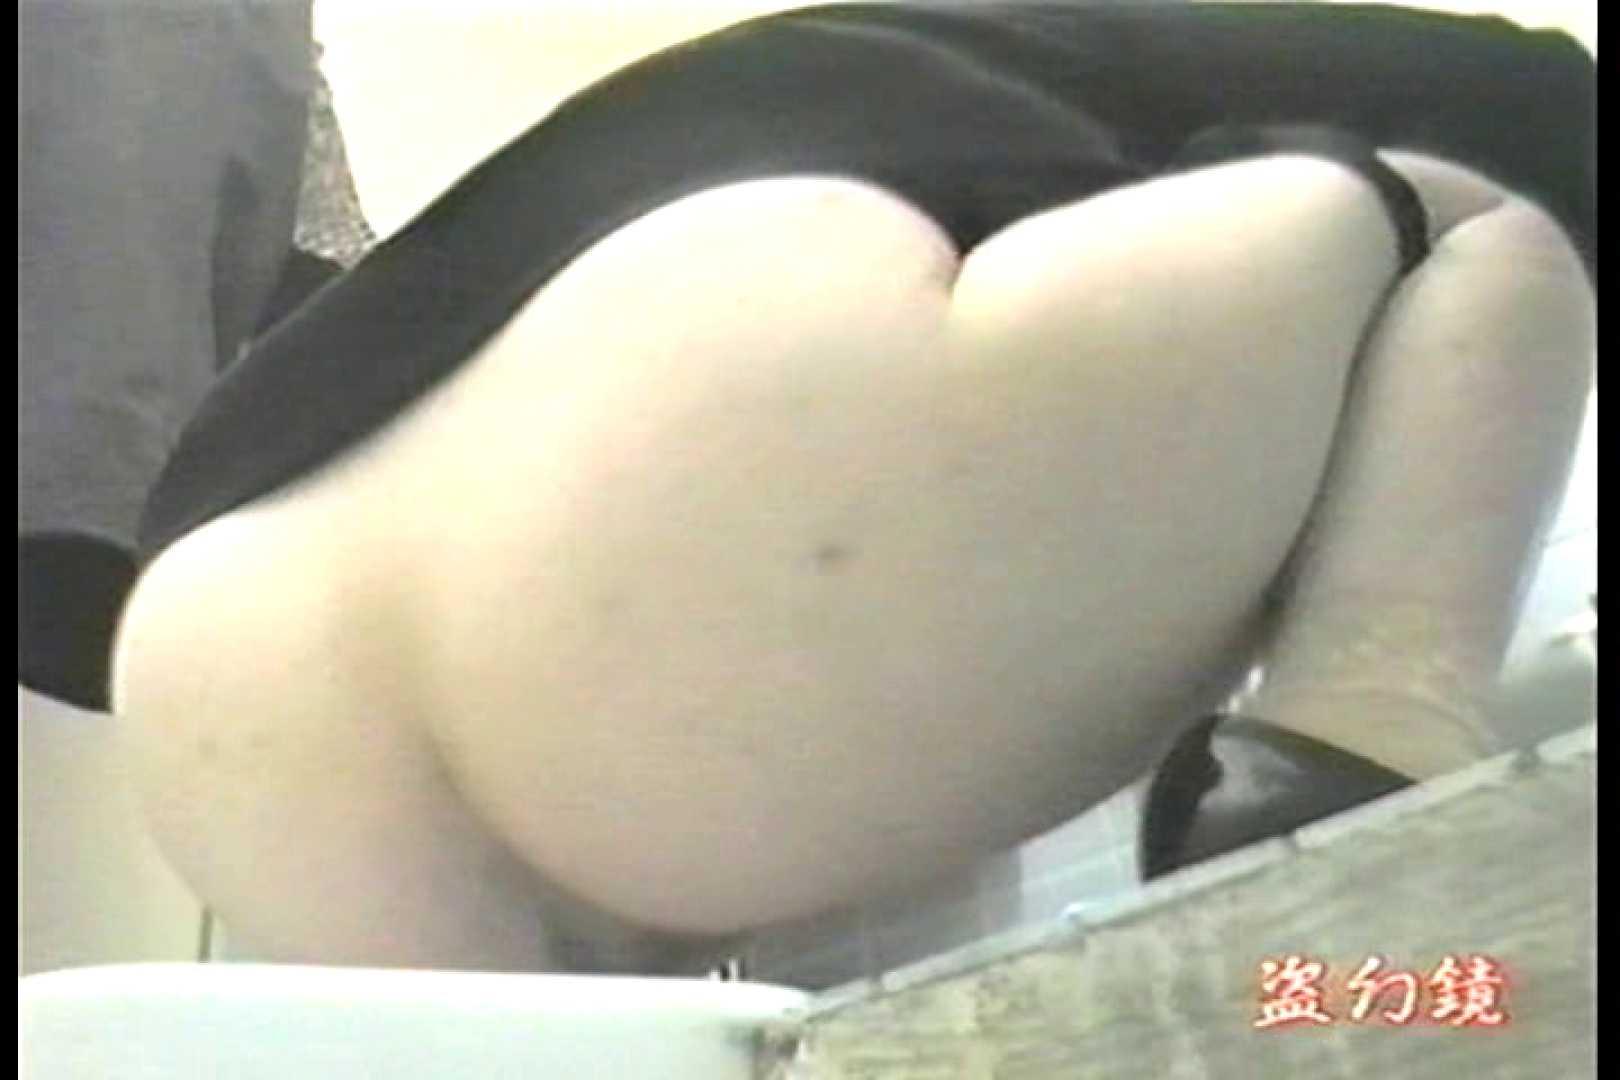 洗面所羞恥美女んMV-2 肛門 ヌード画像 70PIX 14